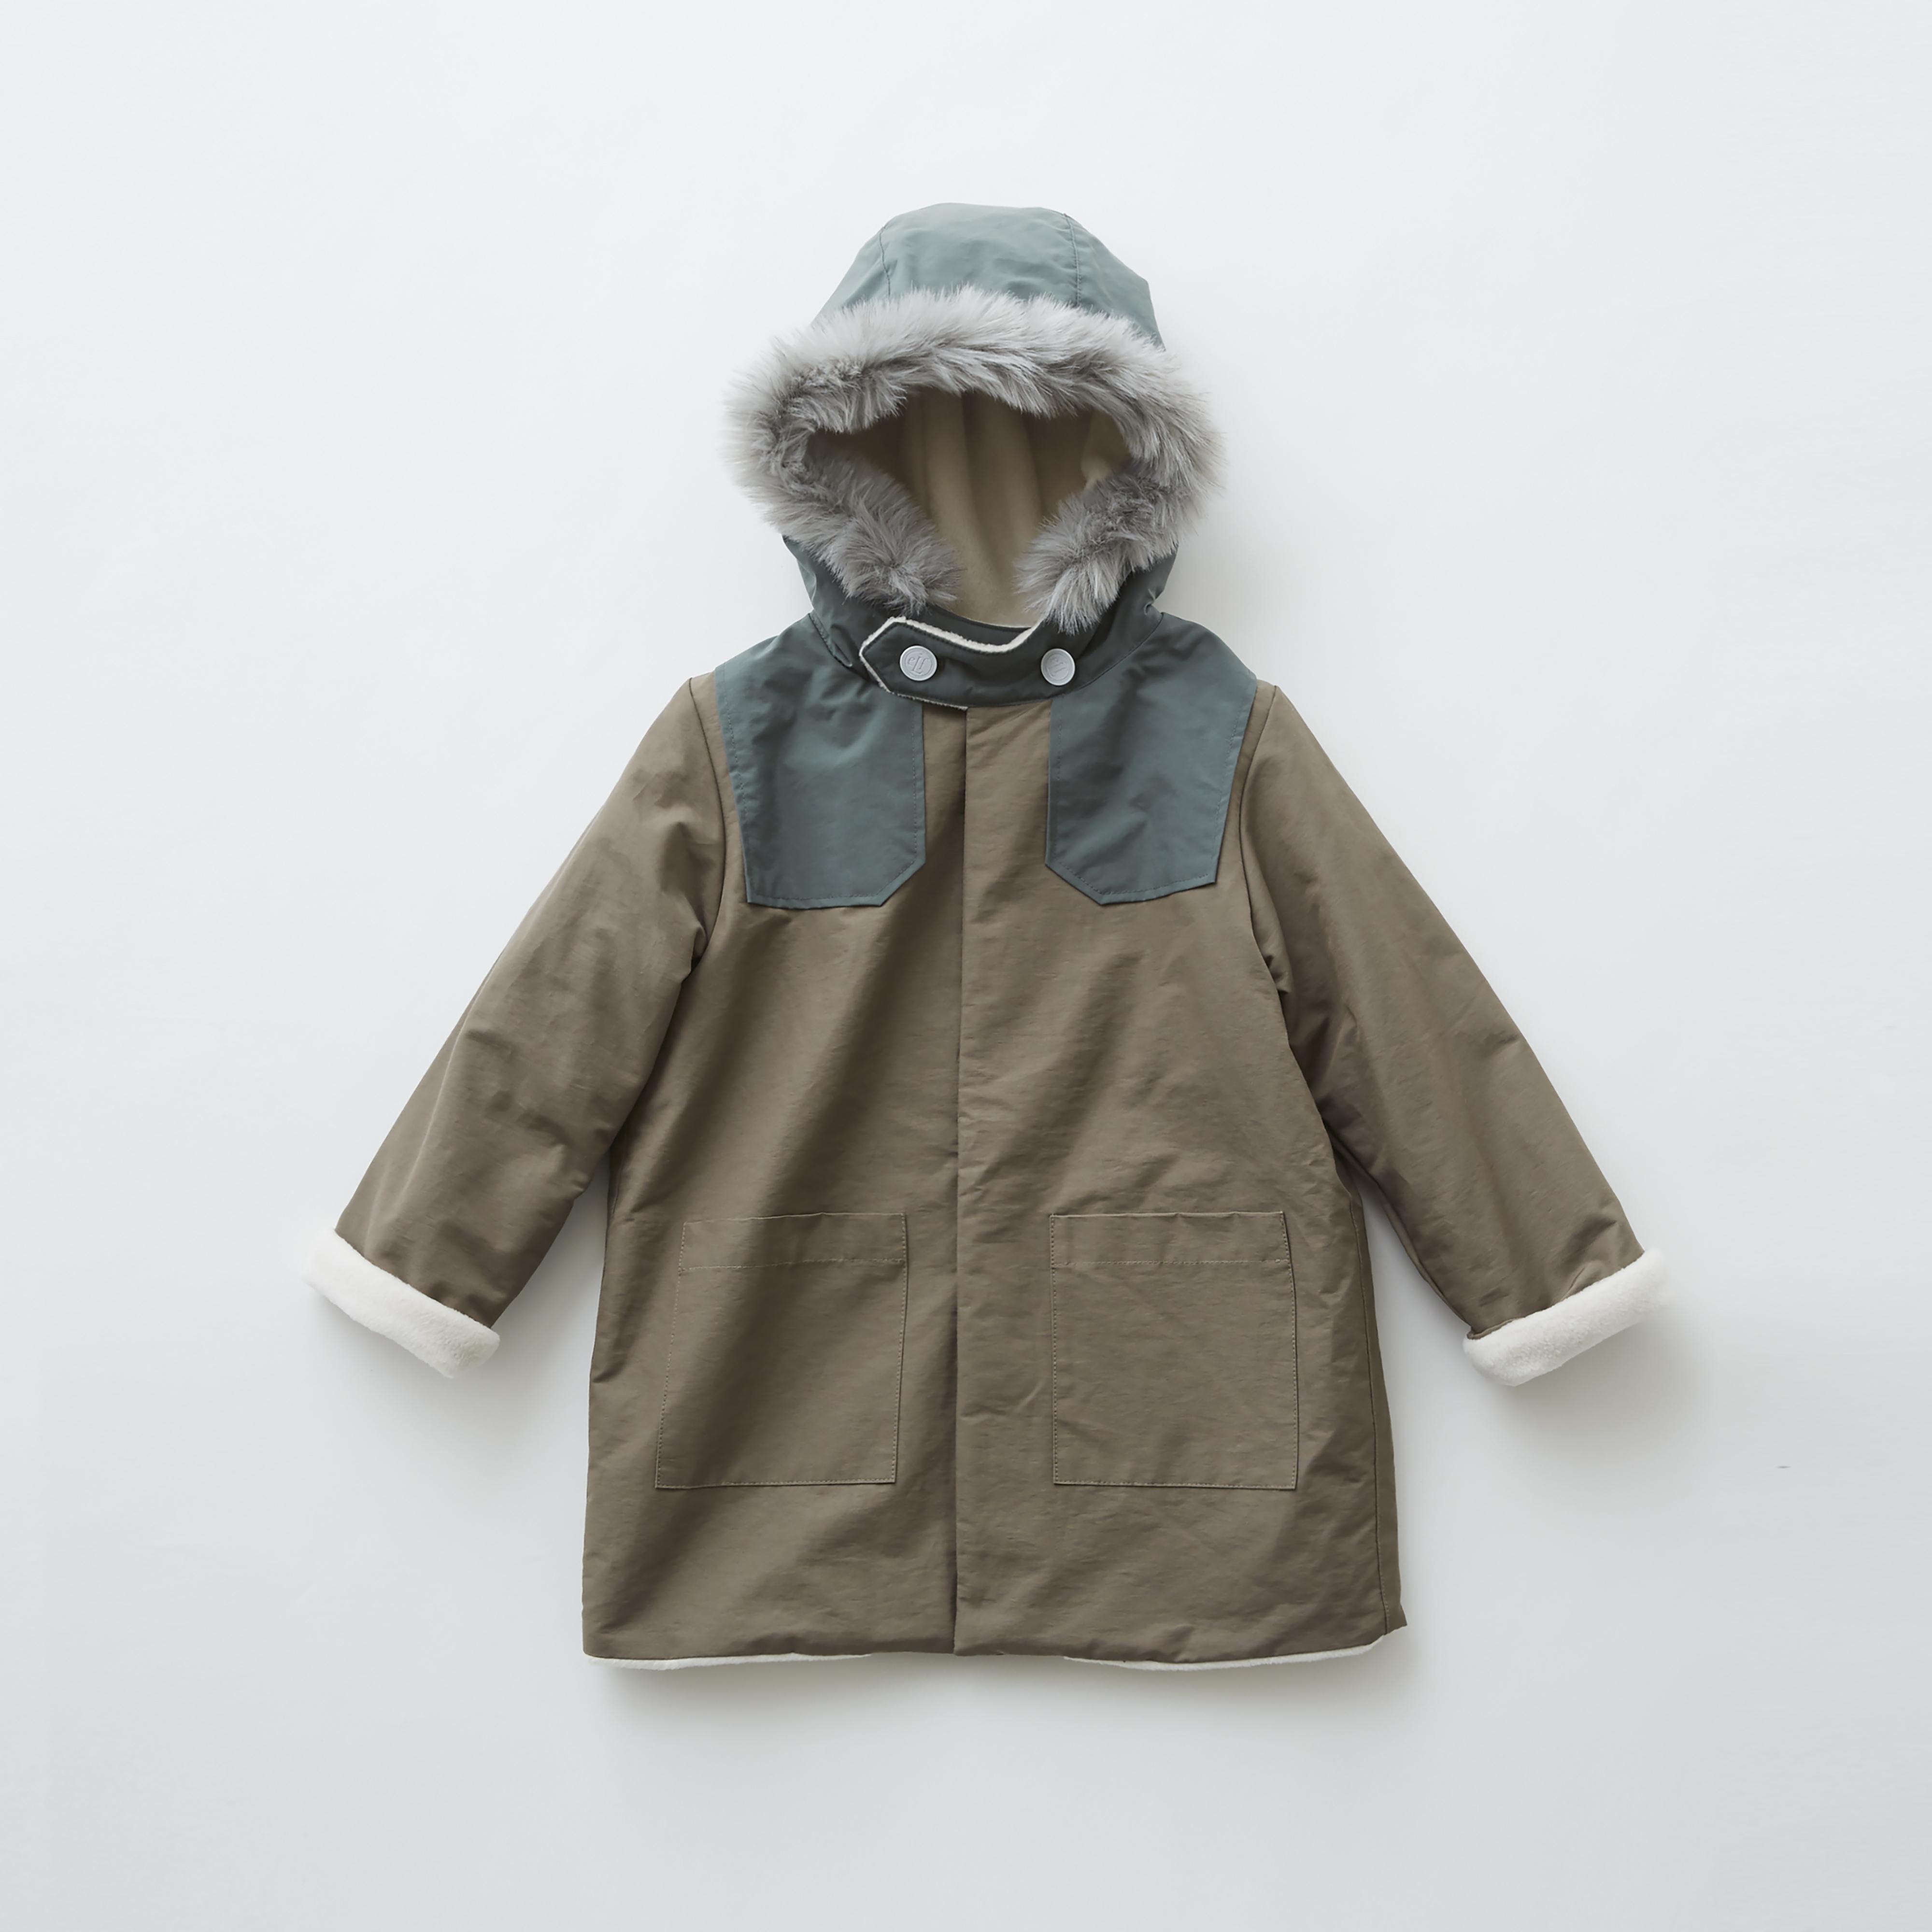 《eLfinFolk 2019AW》high lander coat / mocha / 130cm